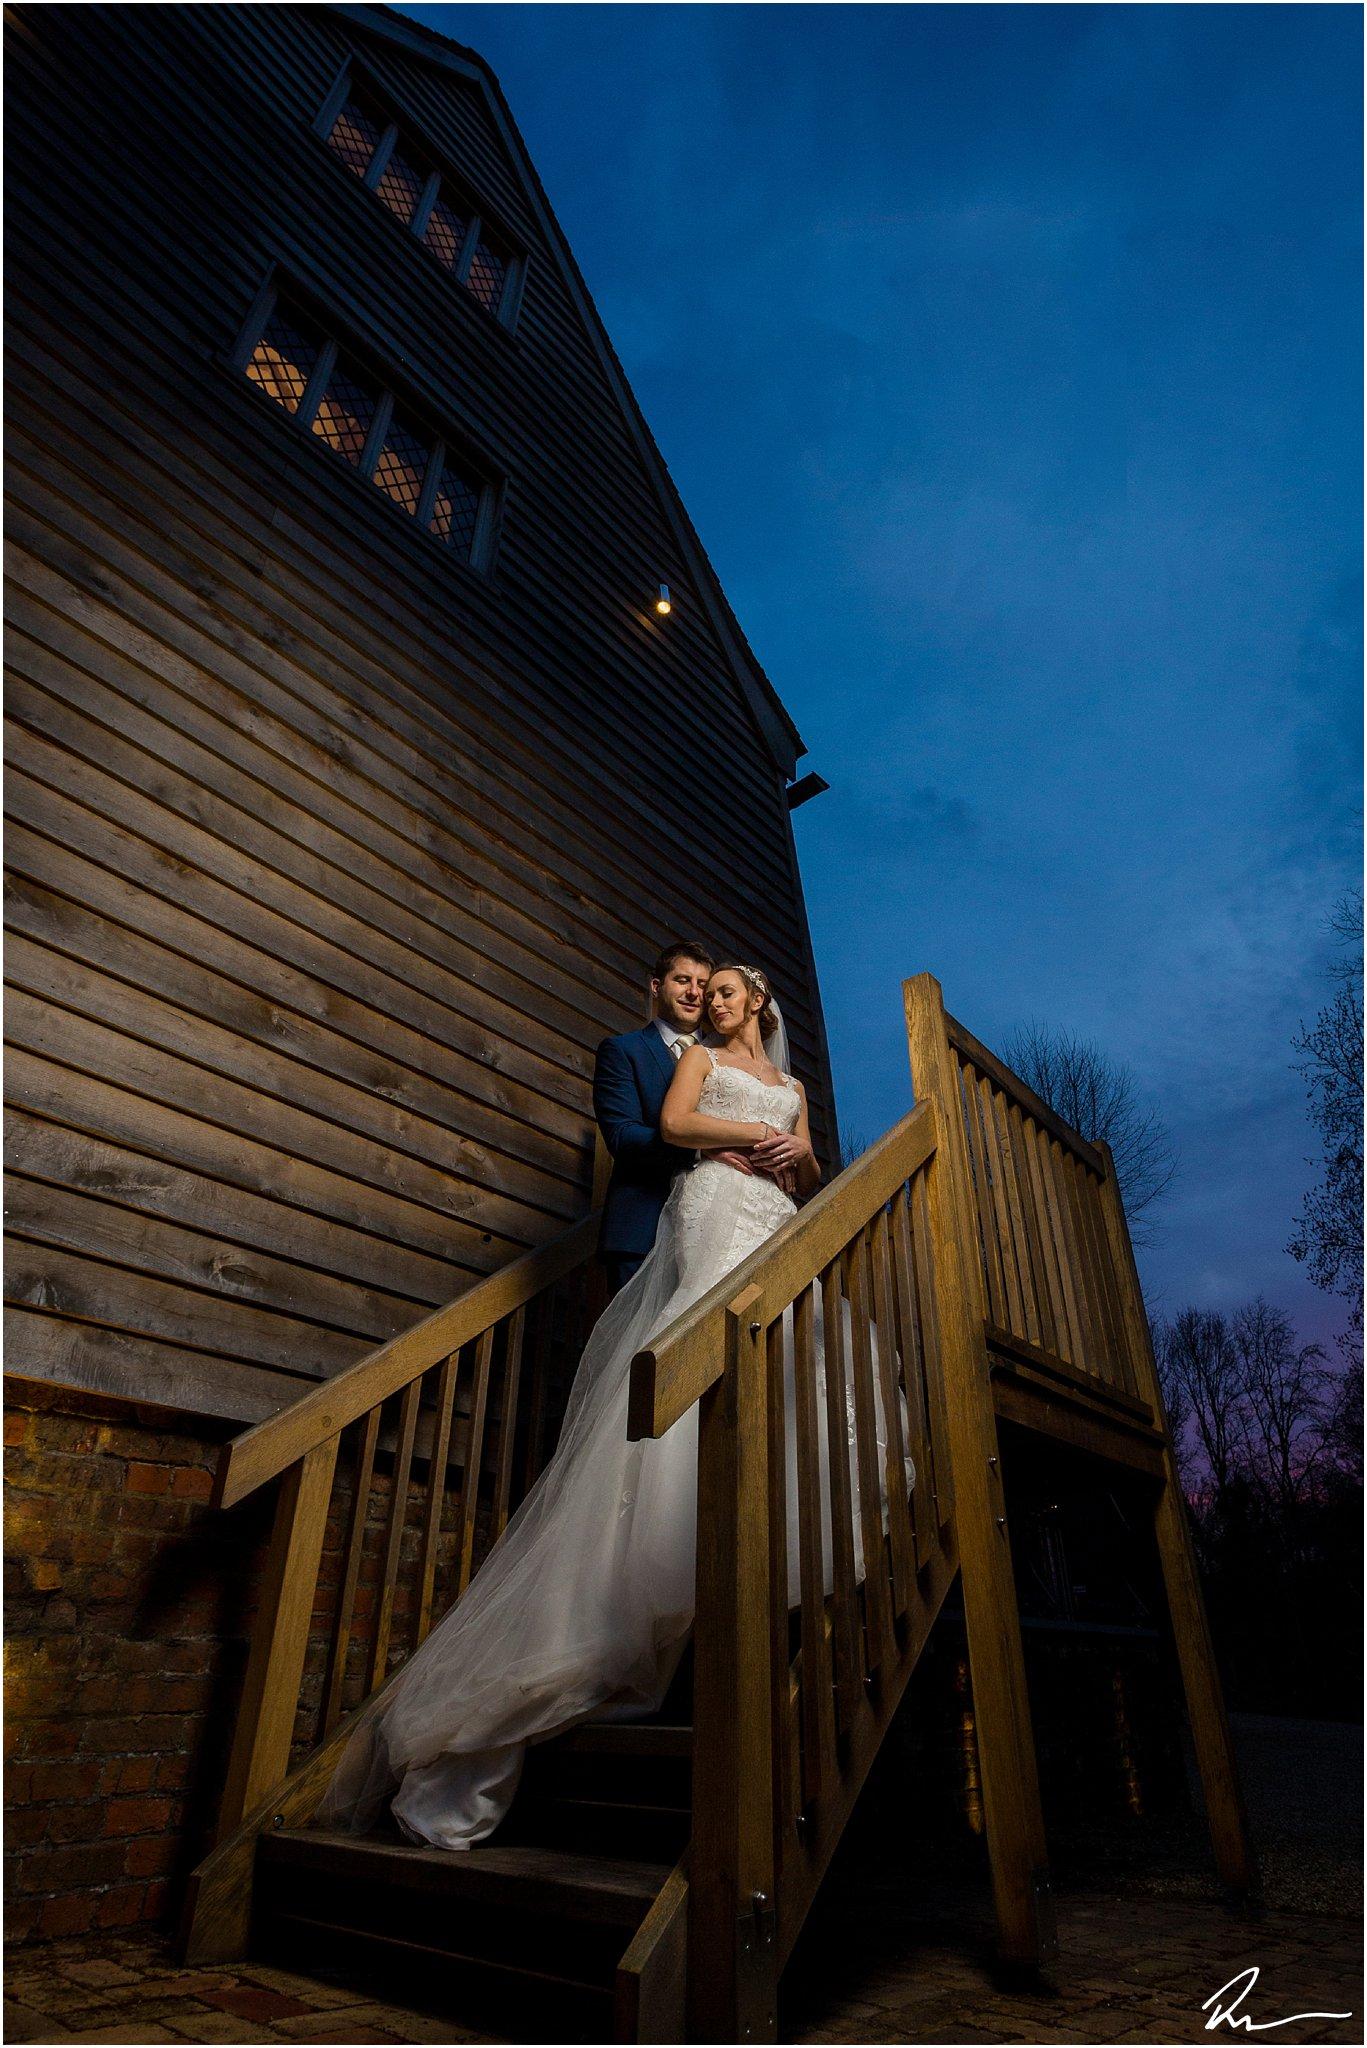 the-tudor-barn-wedding-photographer-suffolk-ross-dean-1.jpg